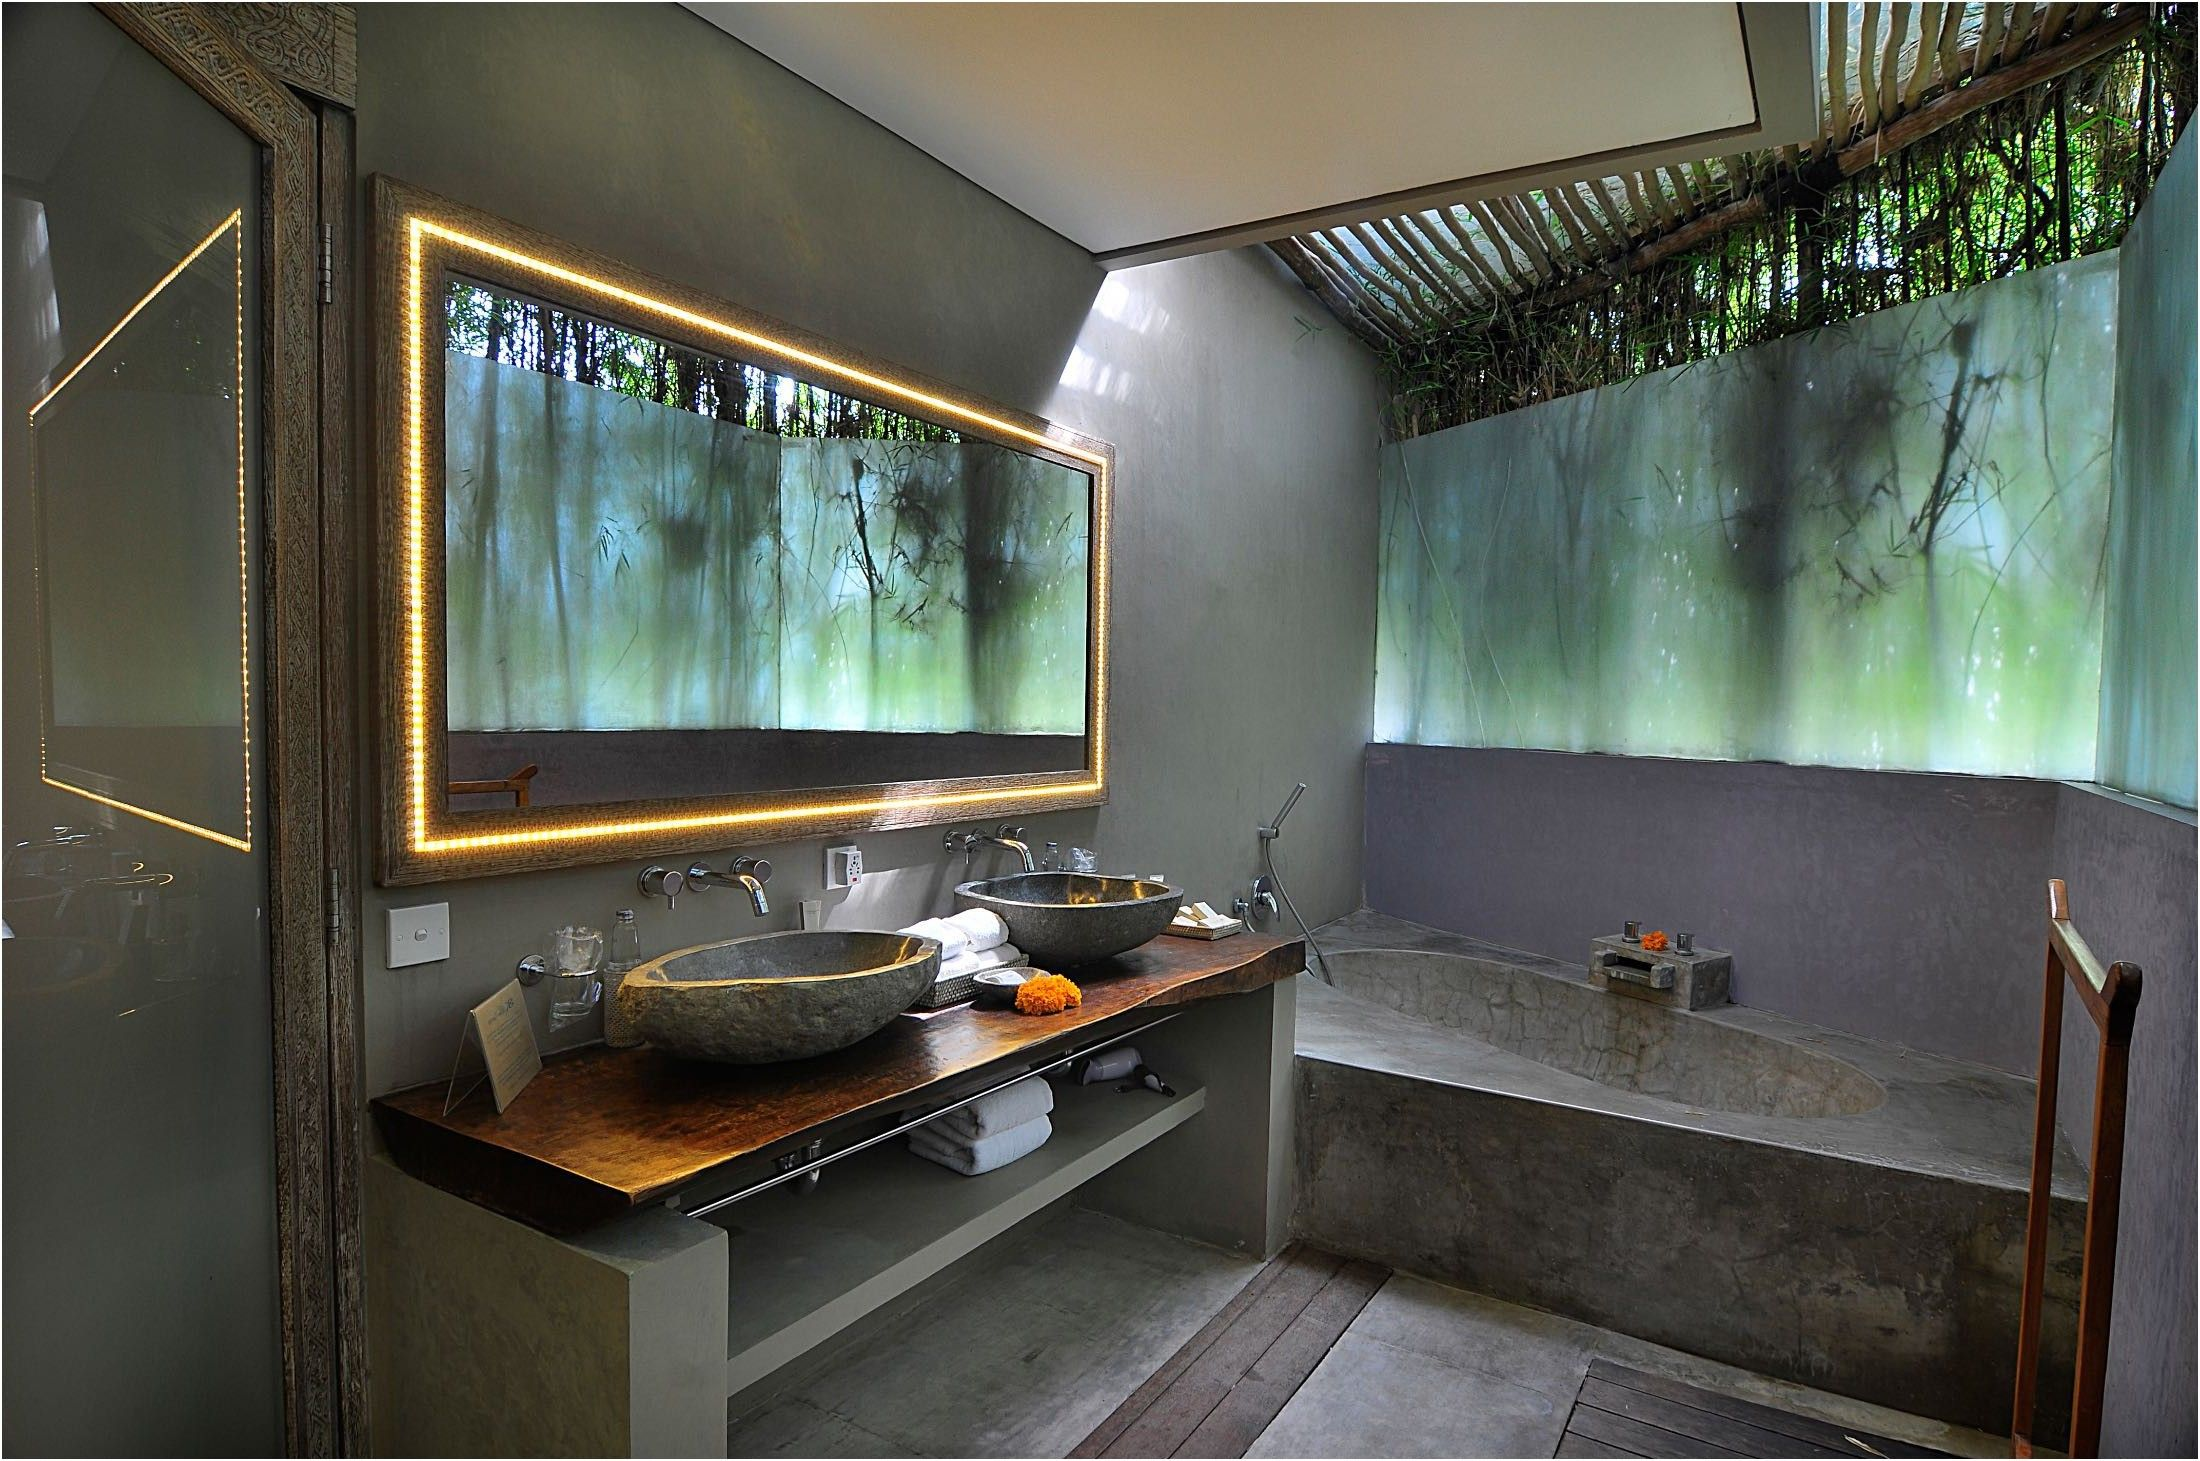 Balinese Bathroom Design Gurdjieffouspensky From Bali Bathroom Design